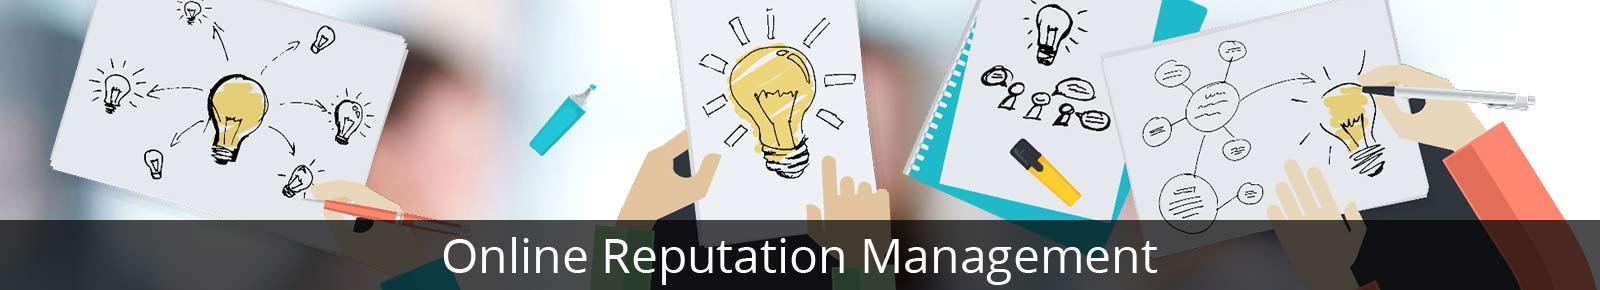 Online Reputation Management Company Sydney